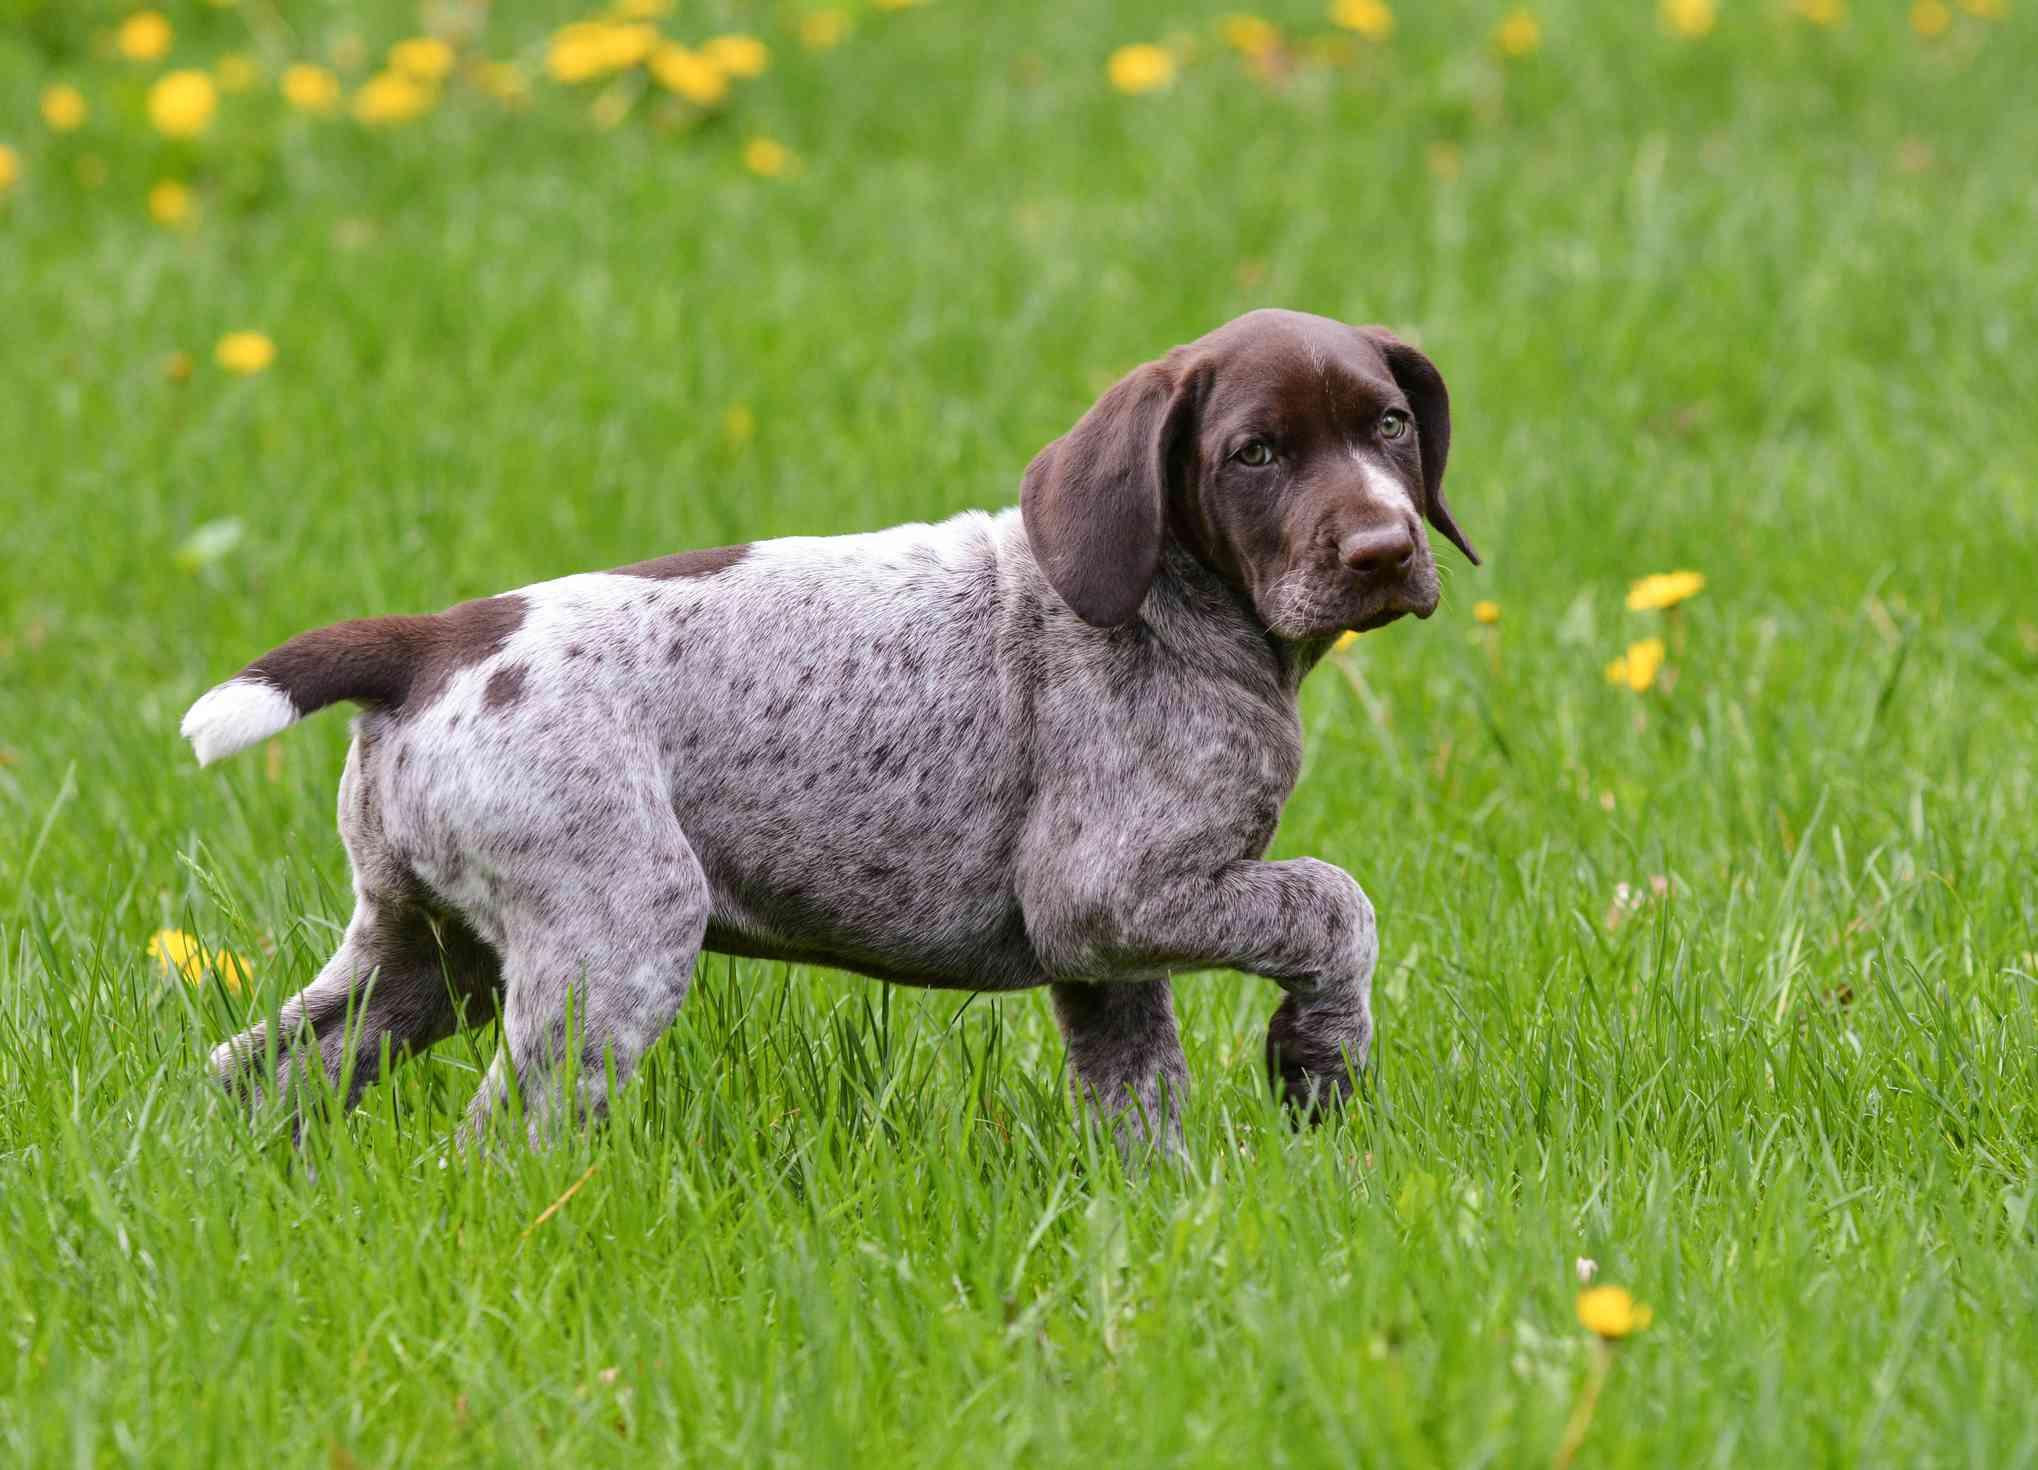 Cachorro de puntero de pelo corto alemán en pasto